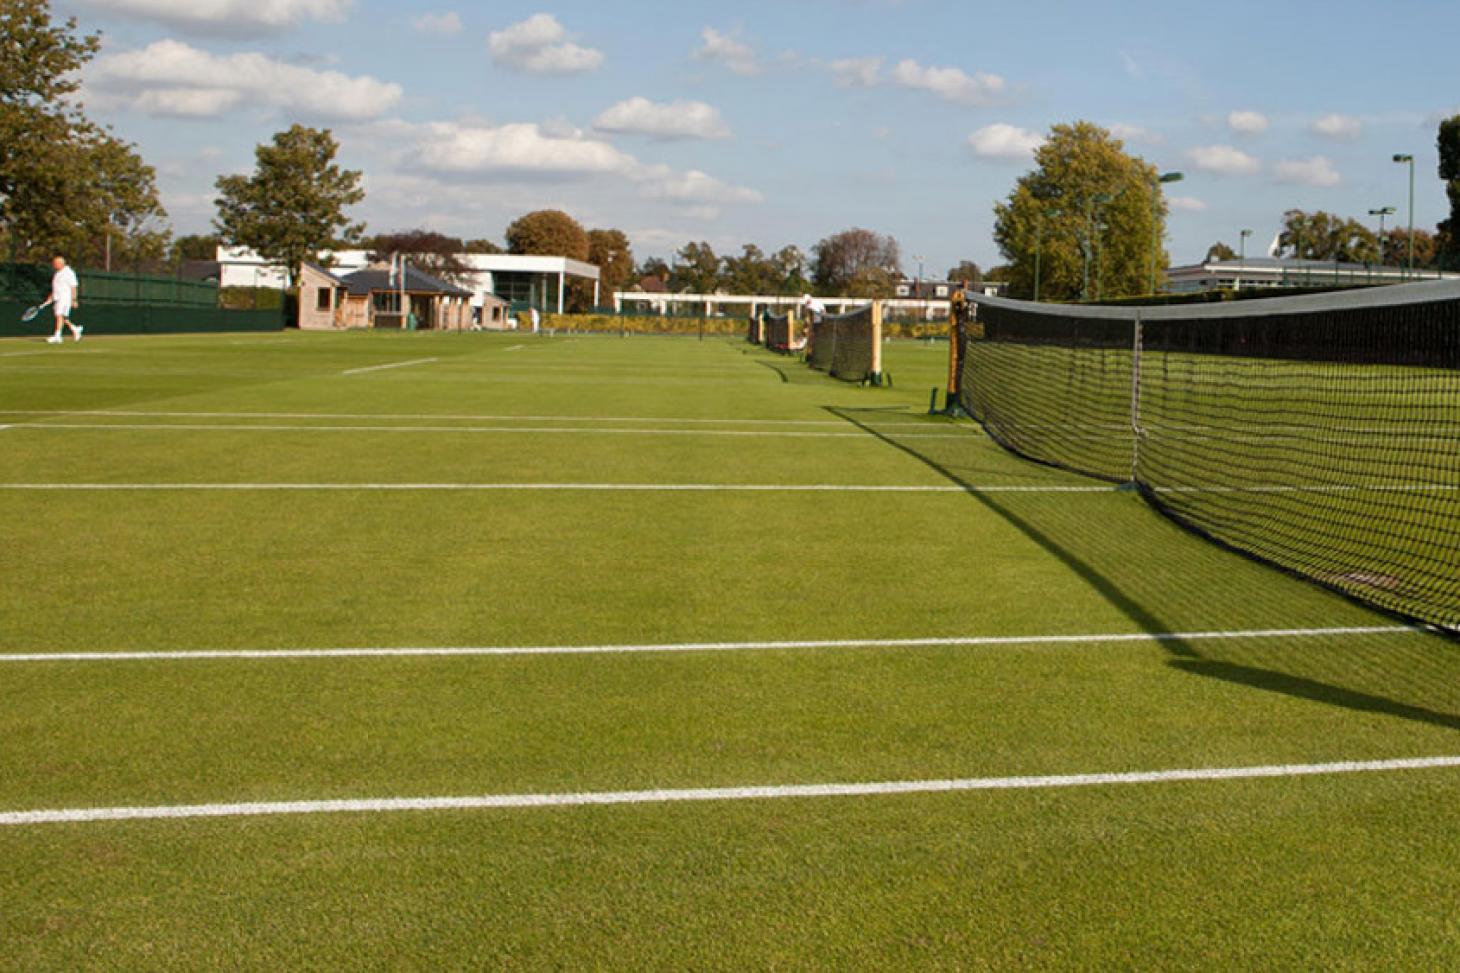 Roehampton Club Outdoor | Grass tennis court